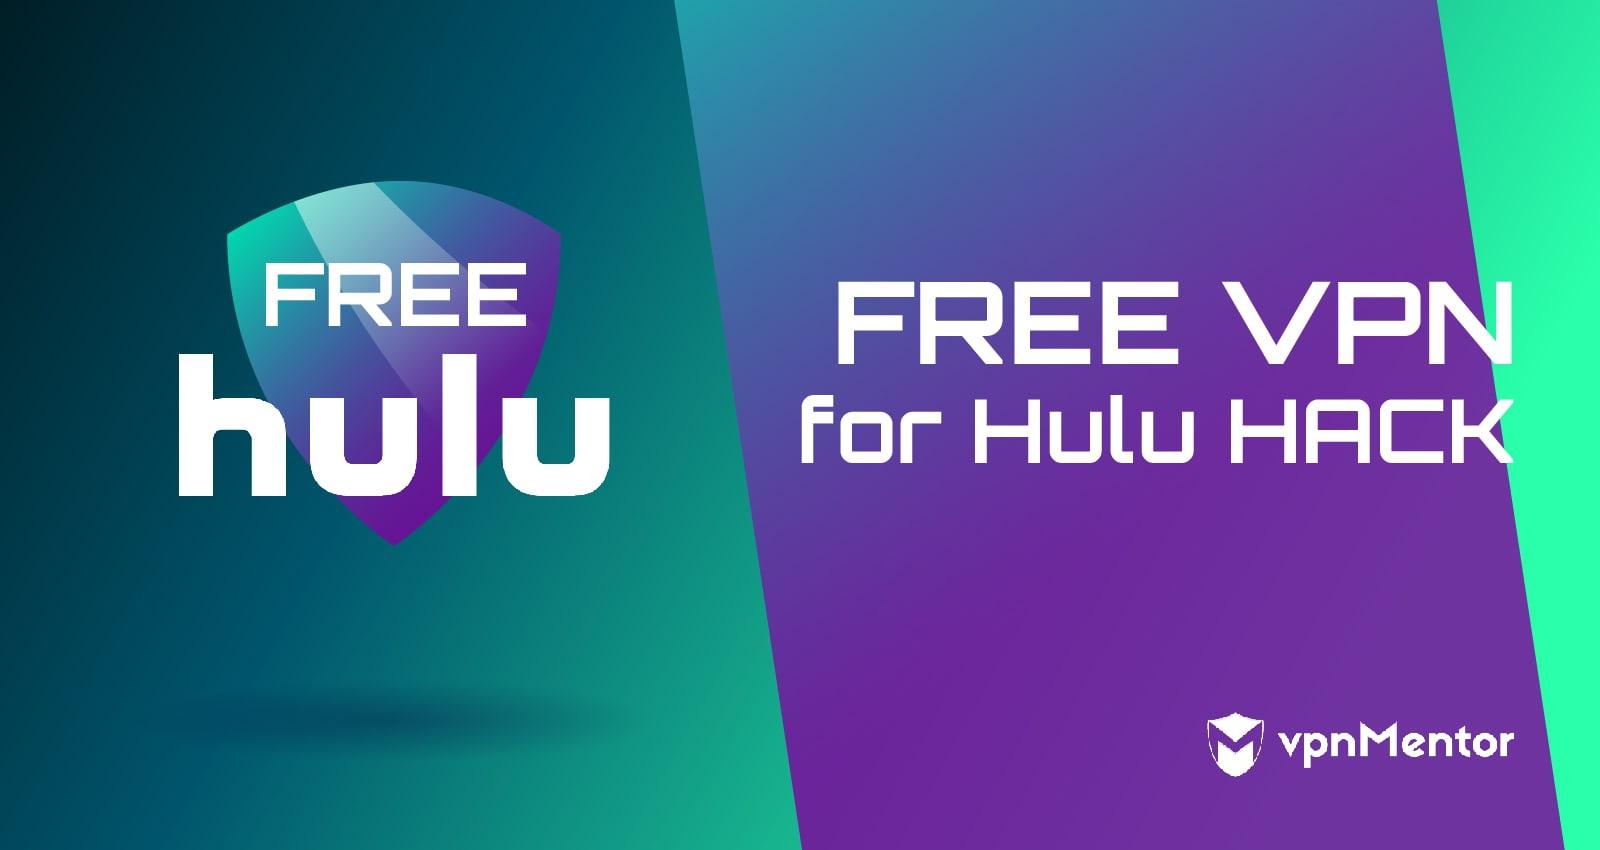 Free VPNs for Hulu